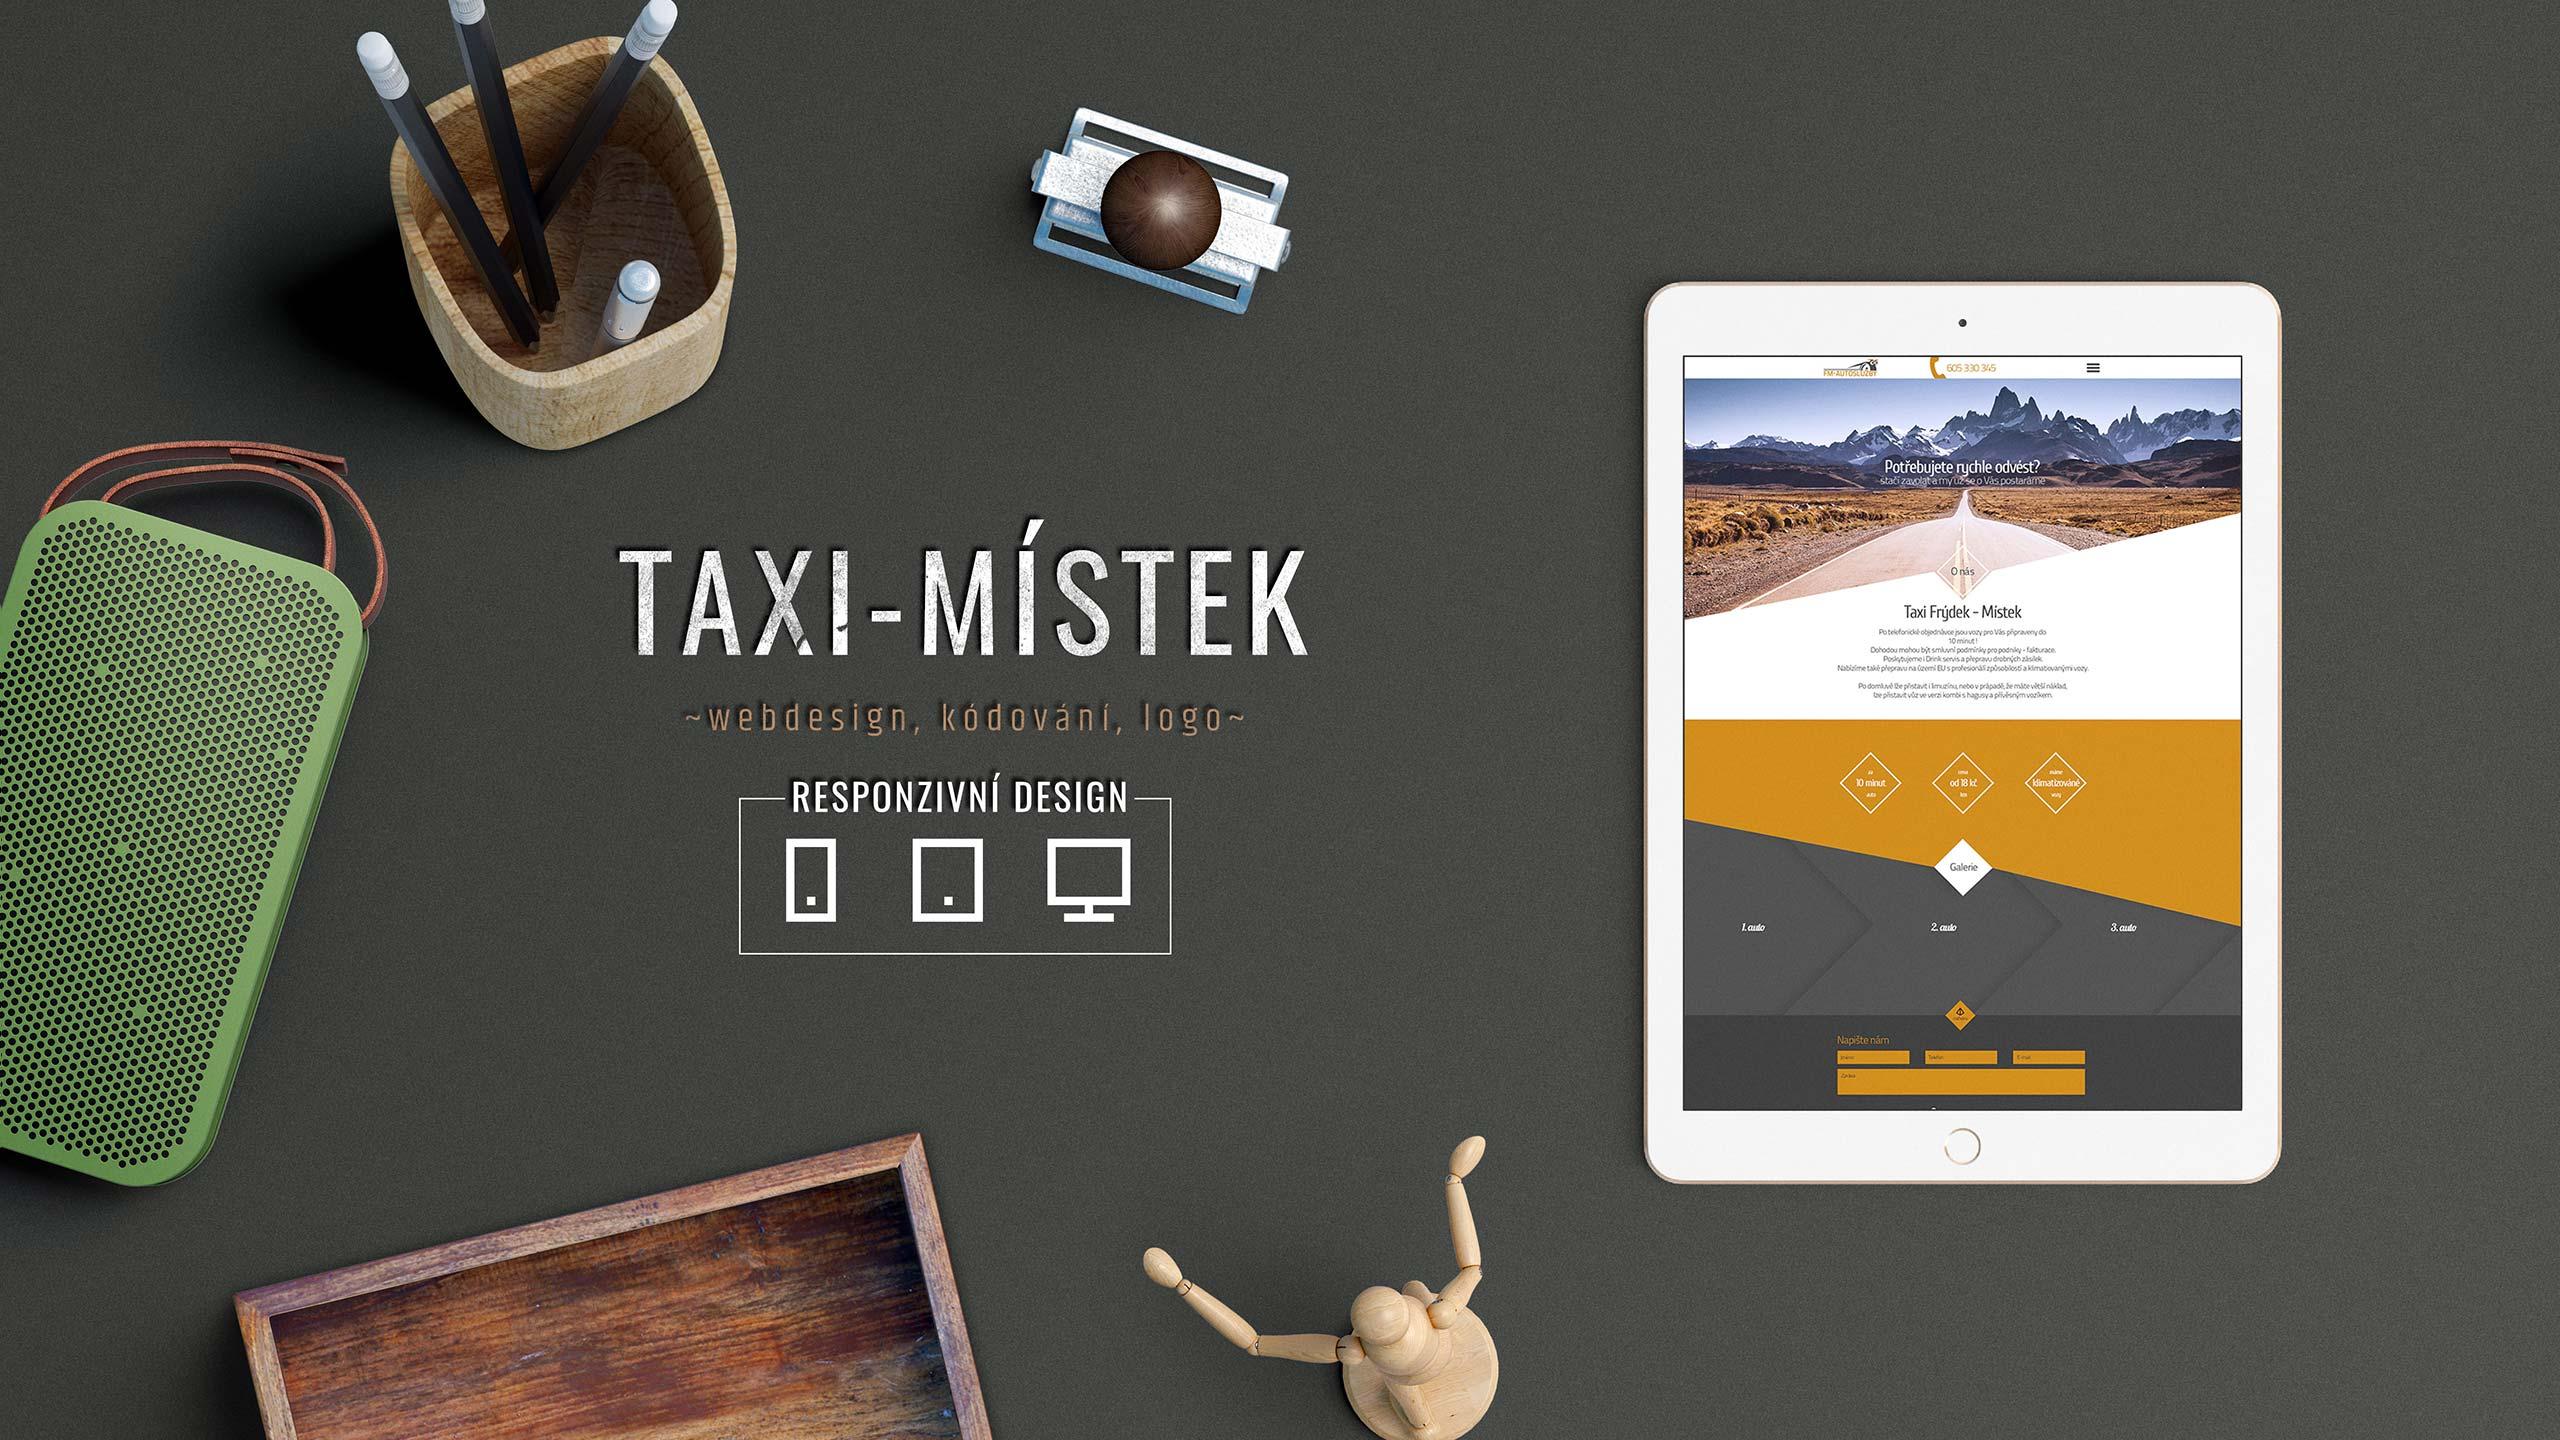 Tvorba www stránek, tiskovin, vizitek pro firmu Taxi-mistek.cz